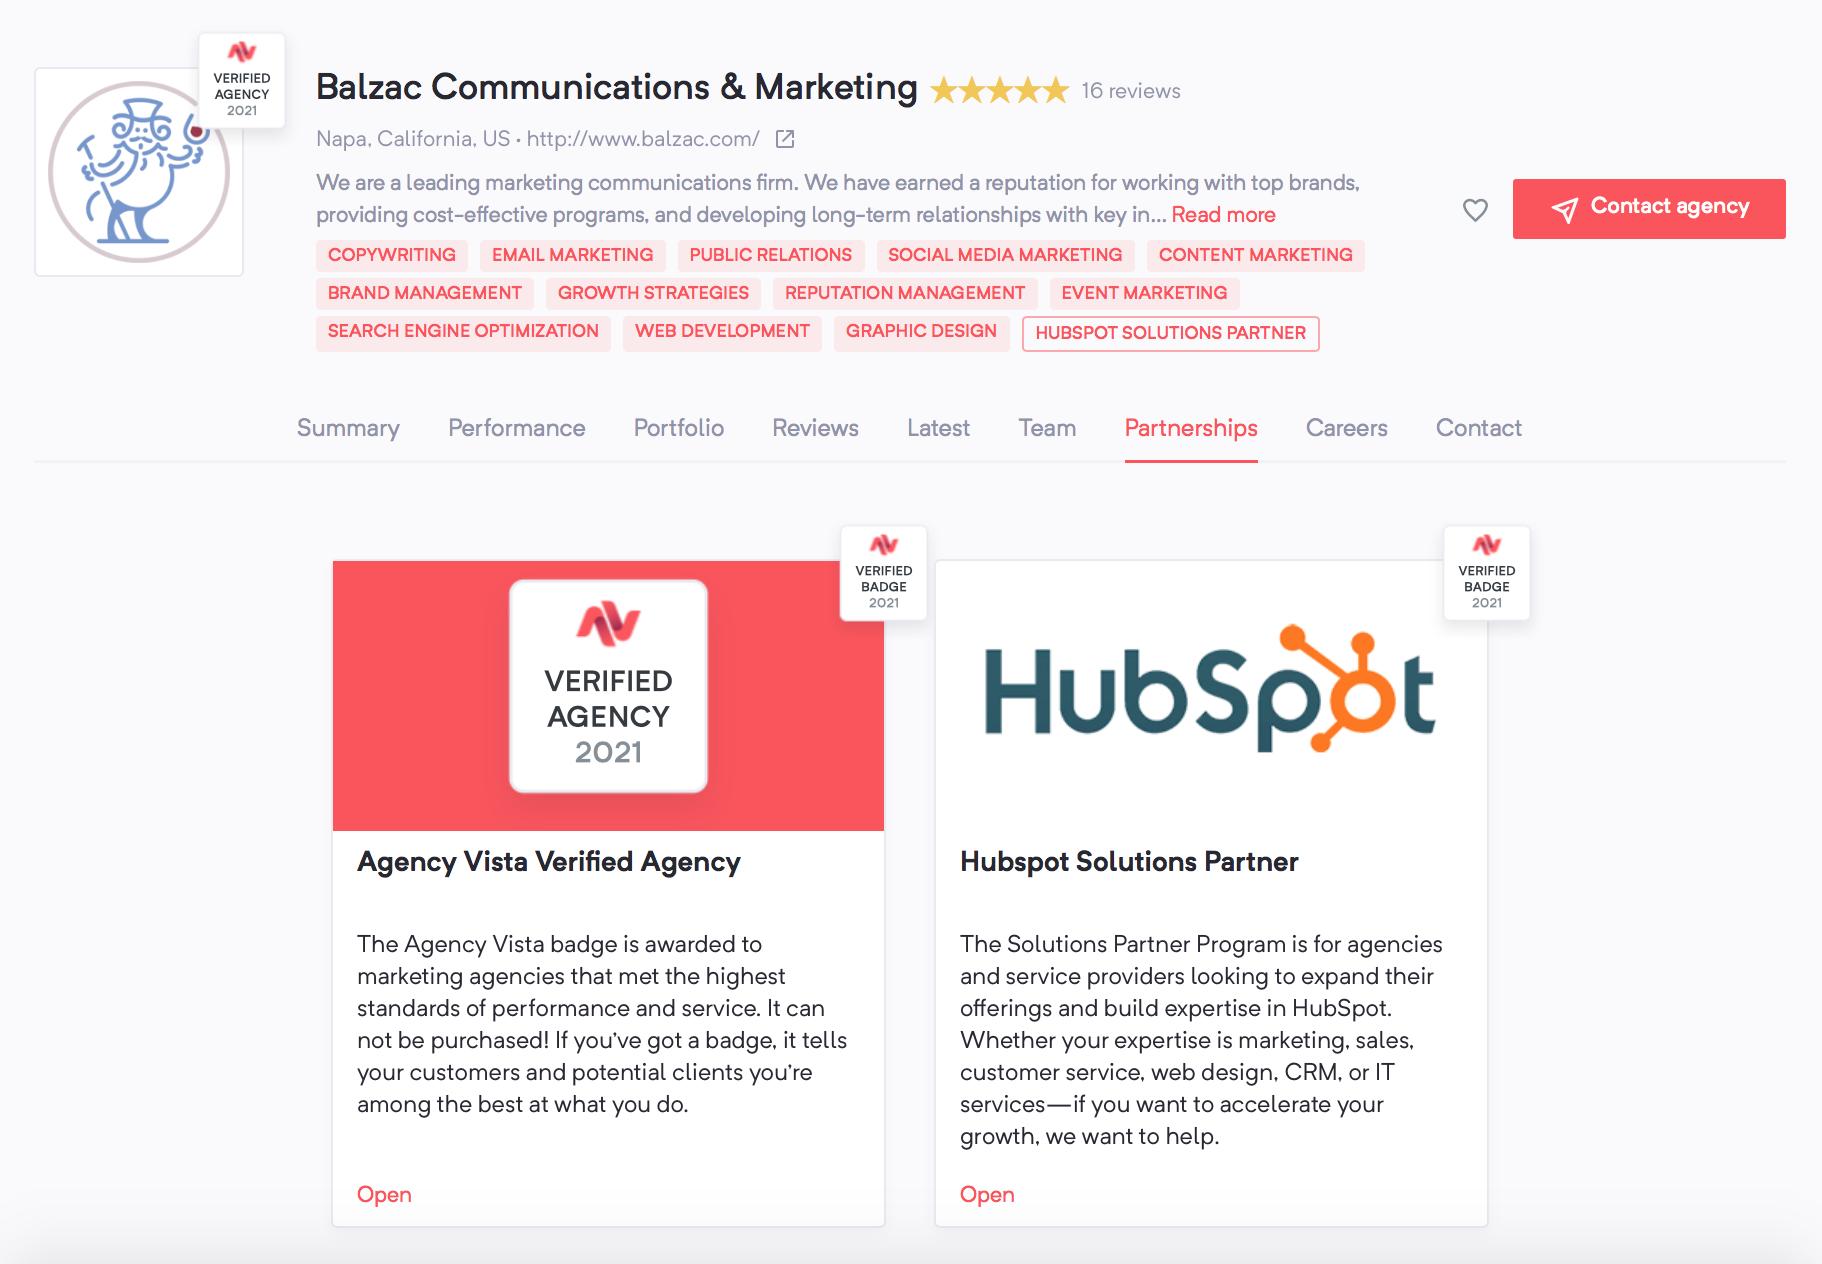 Hiring a Marketing Agency | Balzac Communications & Marketing | Partnerships | Agency Vista